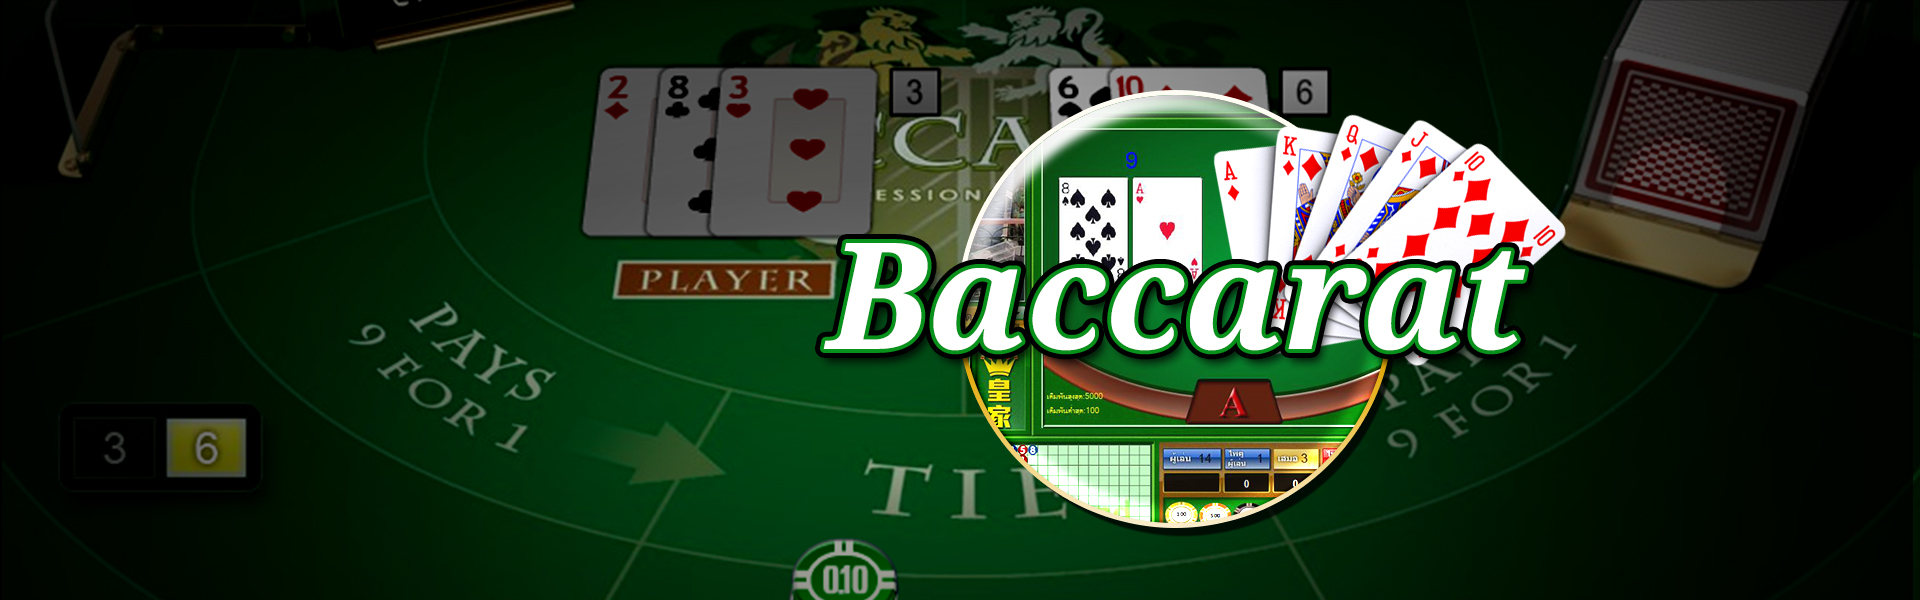 baccarat-casino-website-24.jpg